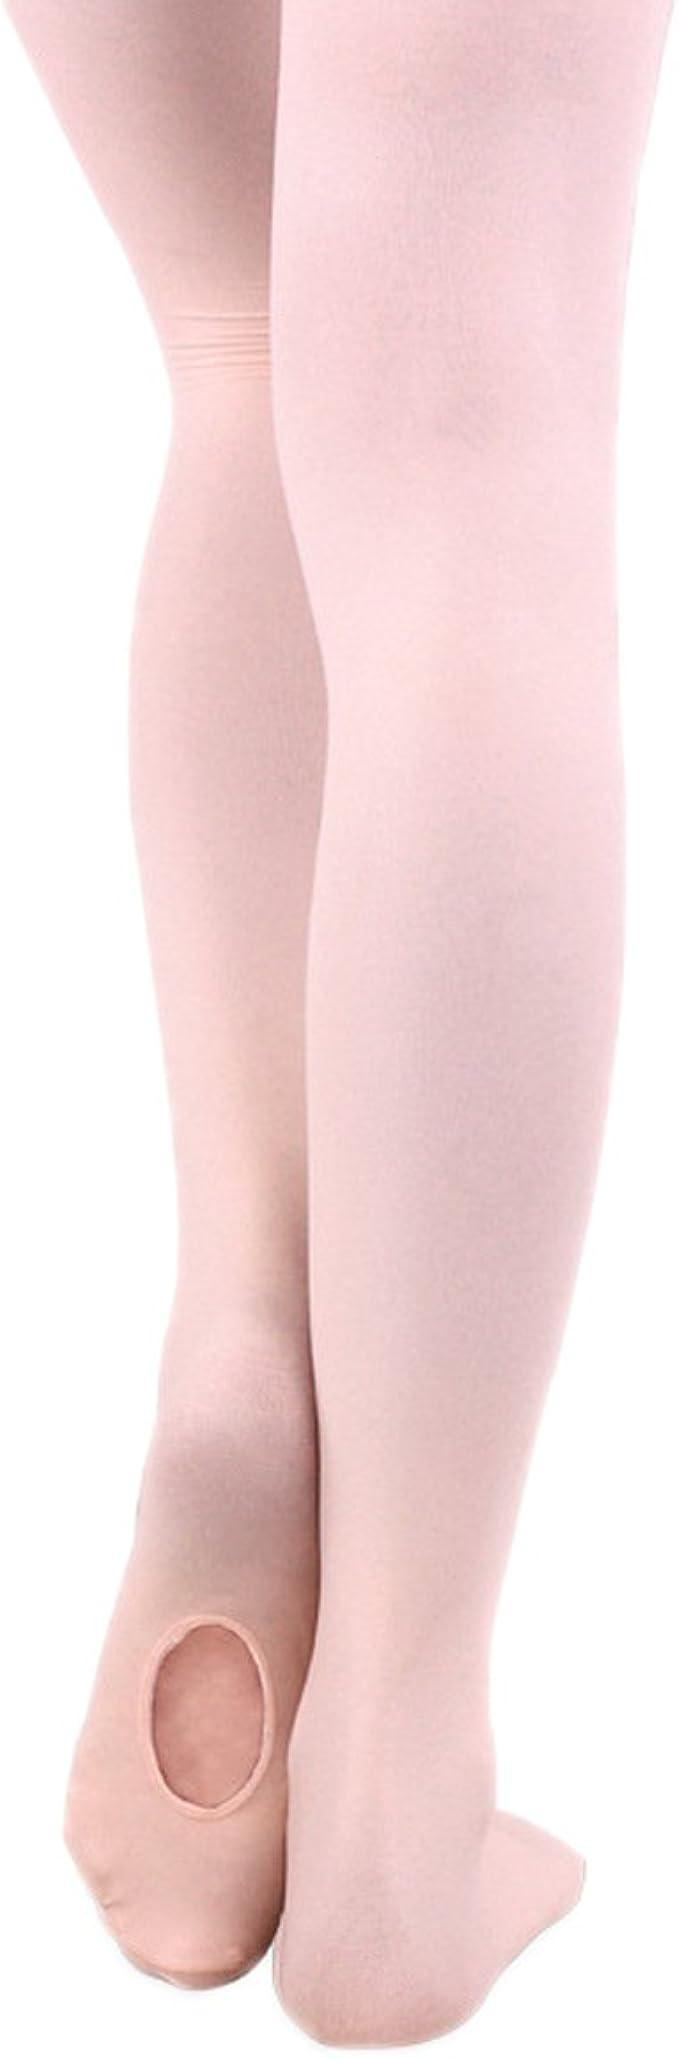 pink Kinder Strumpfhose Ballerina Ballet Strumpfhose Mädchen Feinstrumpfhose